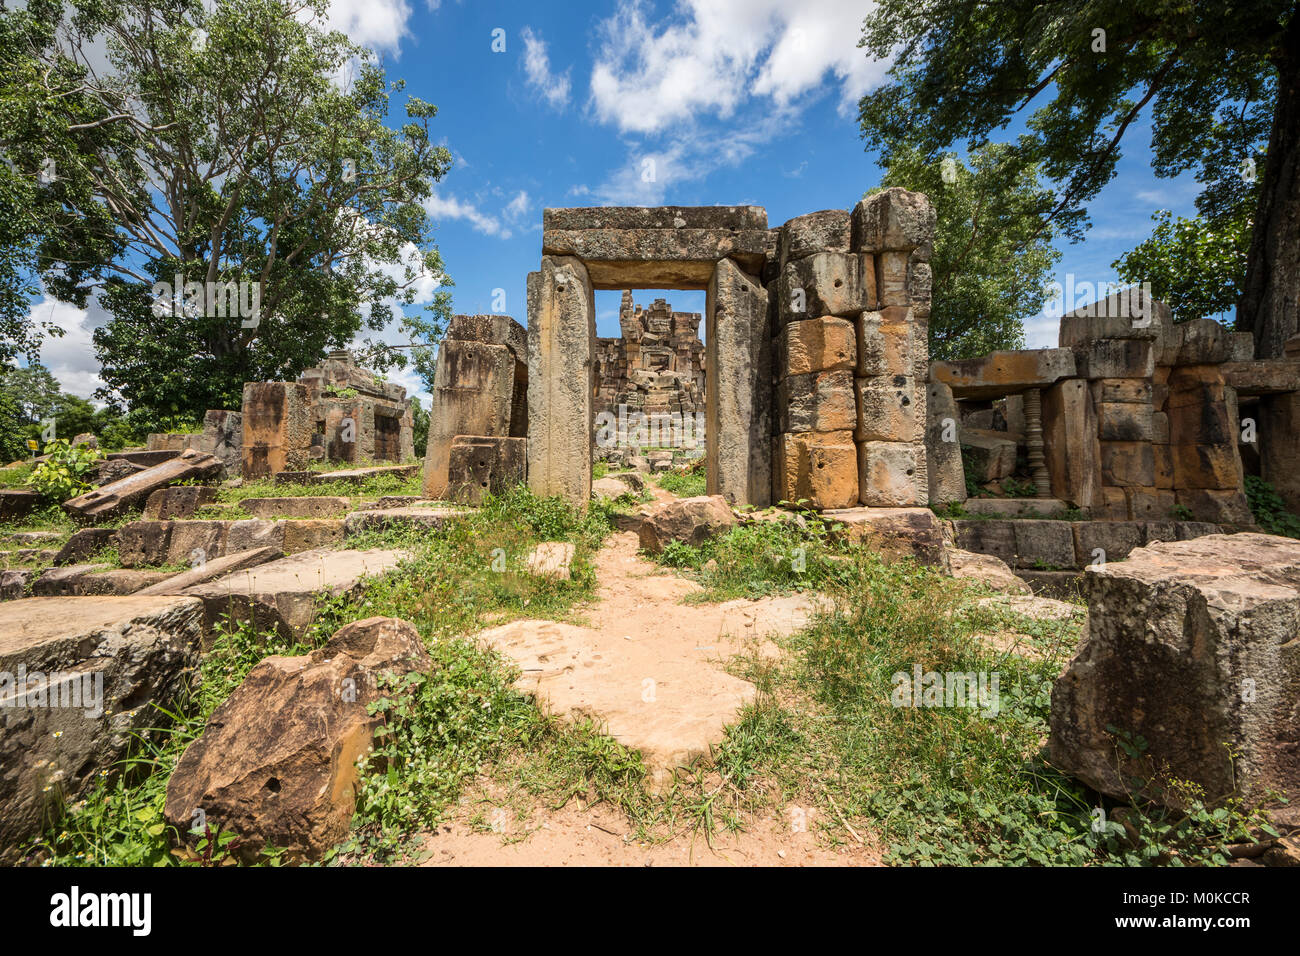 Ancient Angkorian temple at Wat Ek Phnom; Battambang, Cambodia - Stock Image